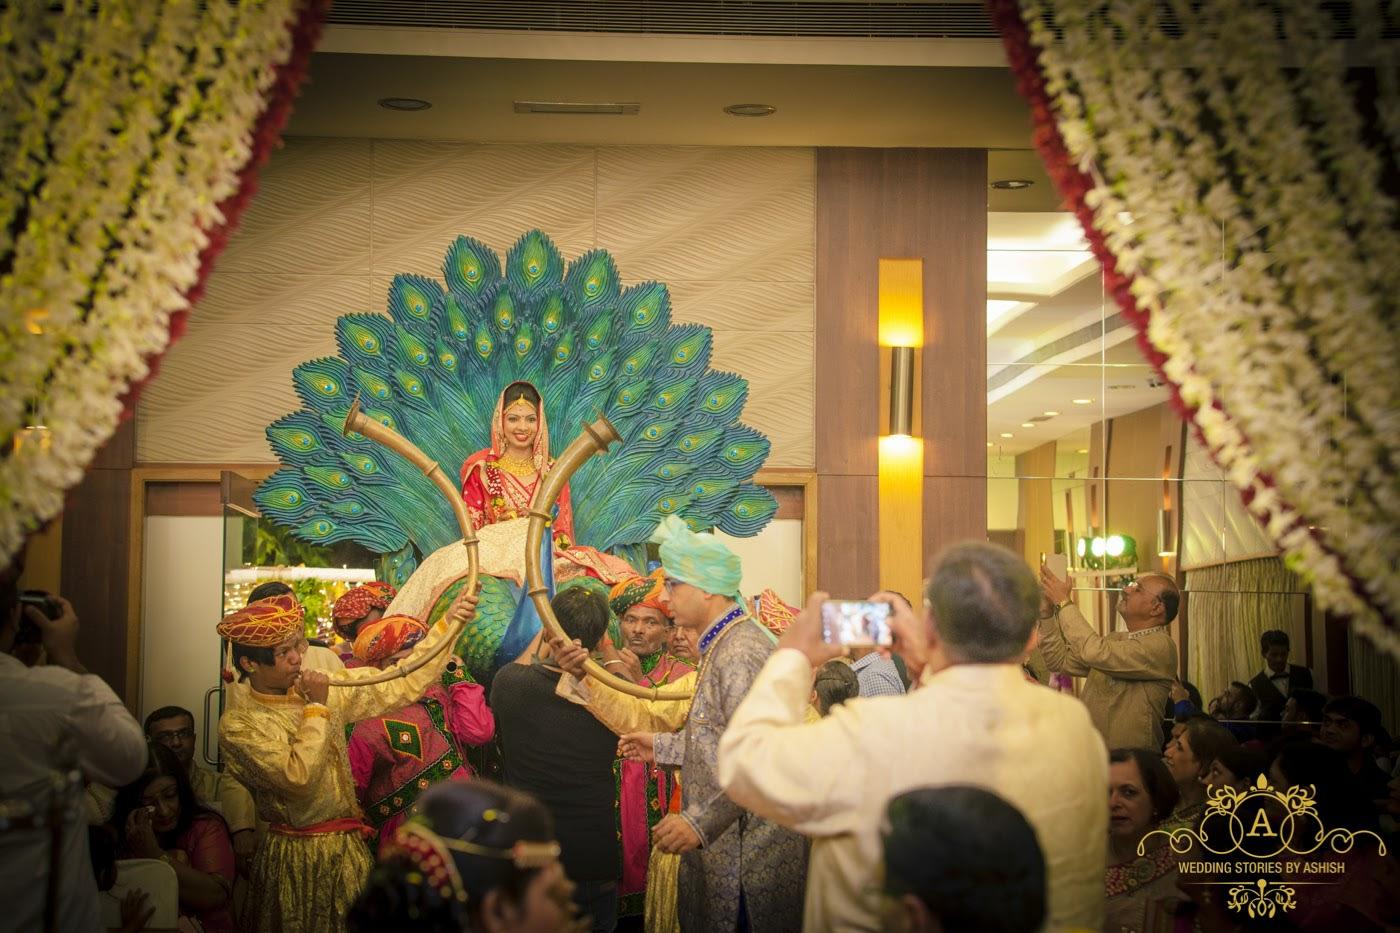 Bride Entring In A Royal Way by Ashish Vengurlekar Wedding-photography | Weddings Photos & Ideas